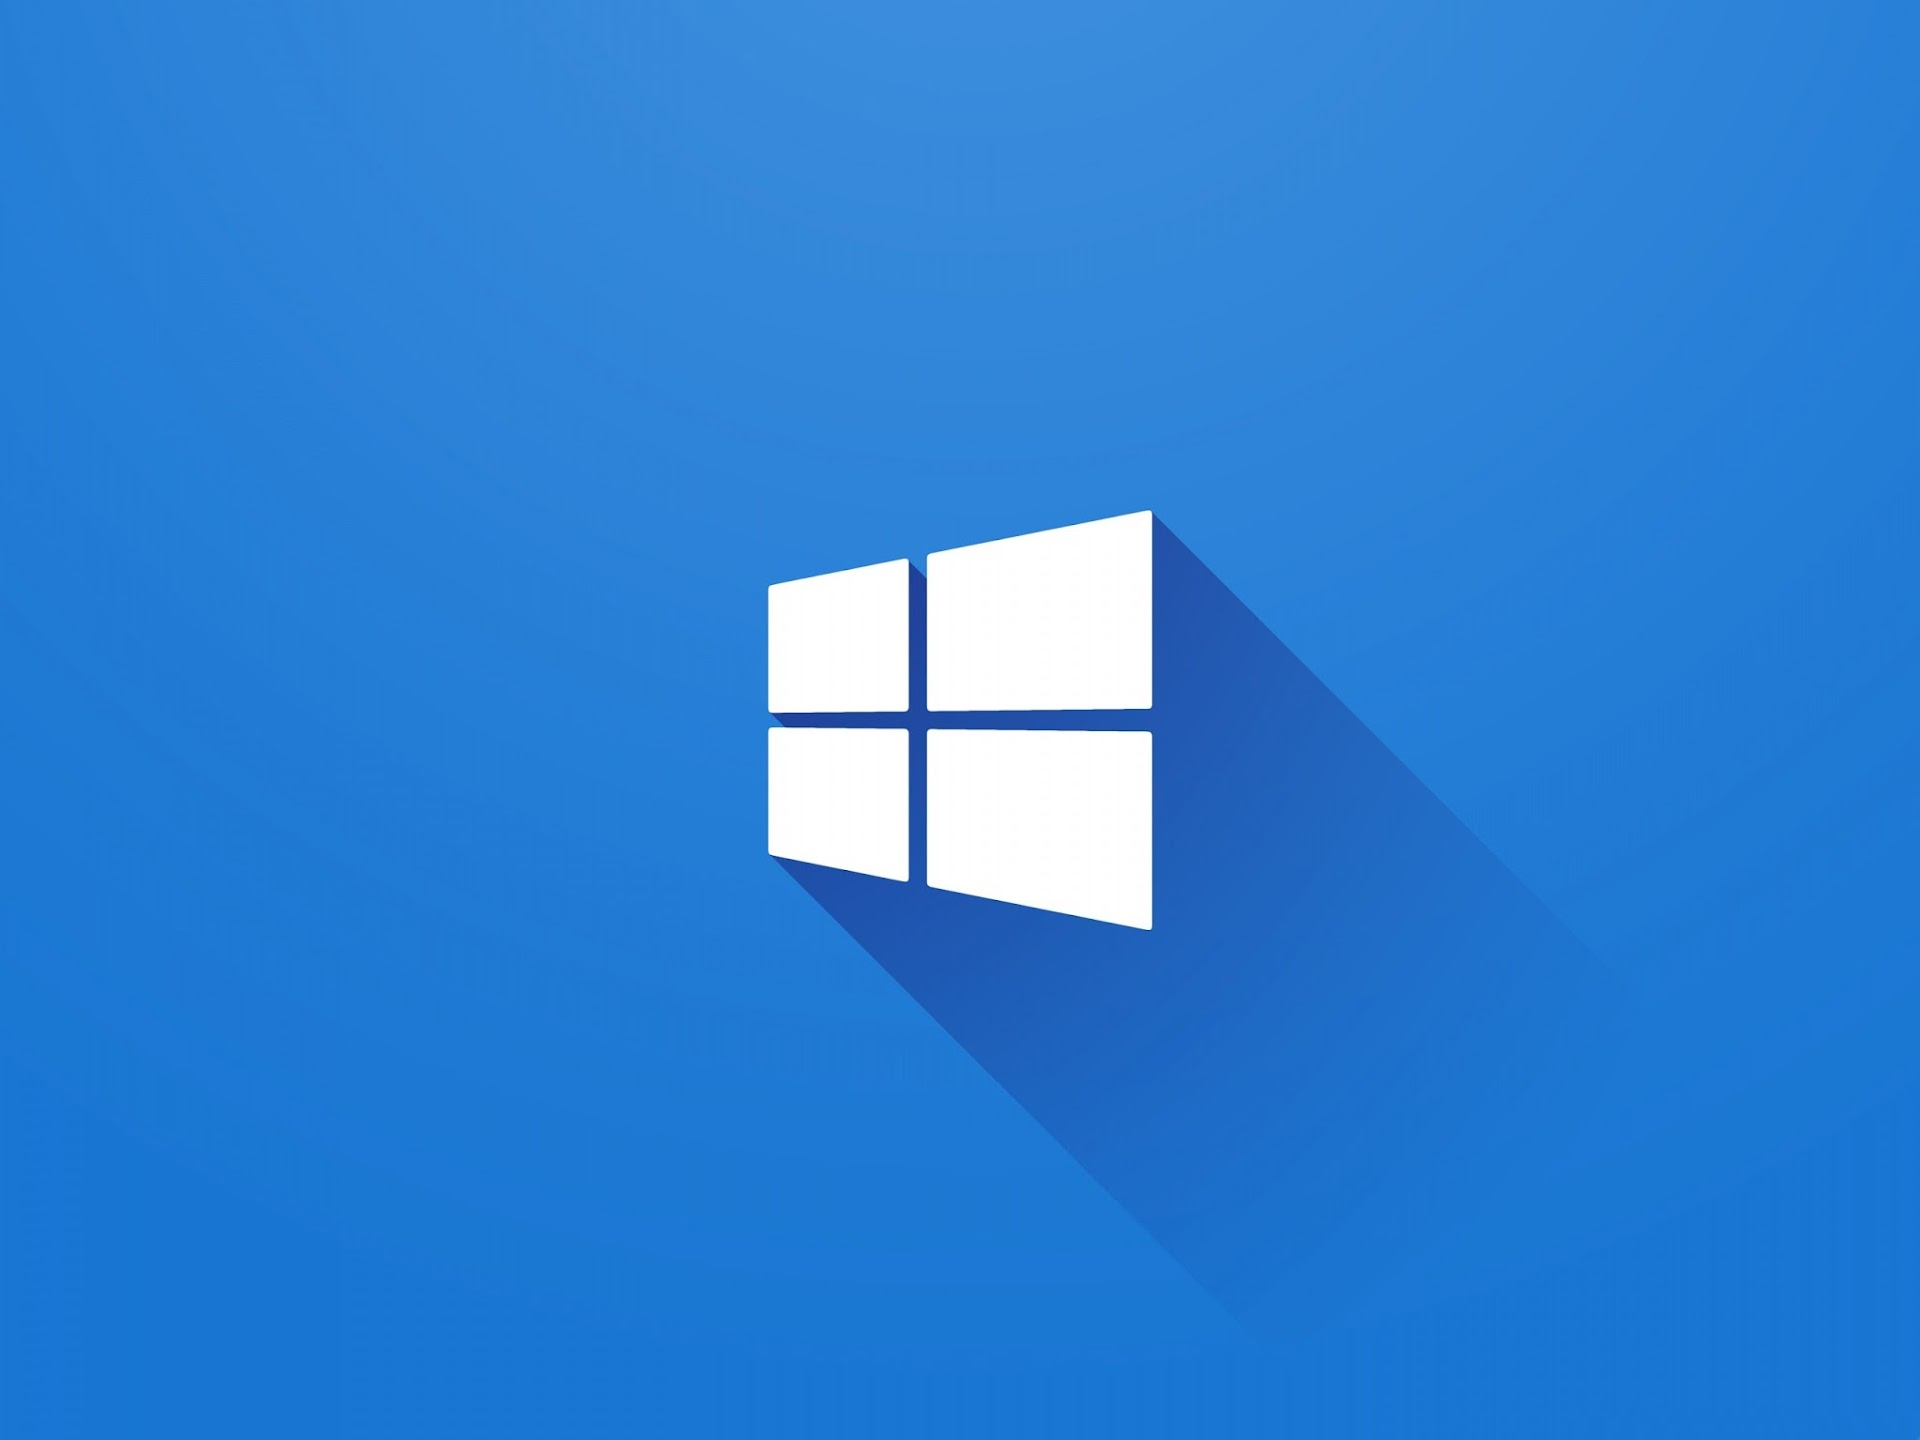 Papel de Parede Windows 10 para pc hd grátis Windows desktop hd wallpaper image free